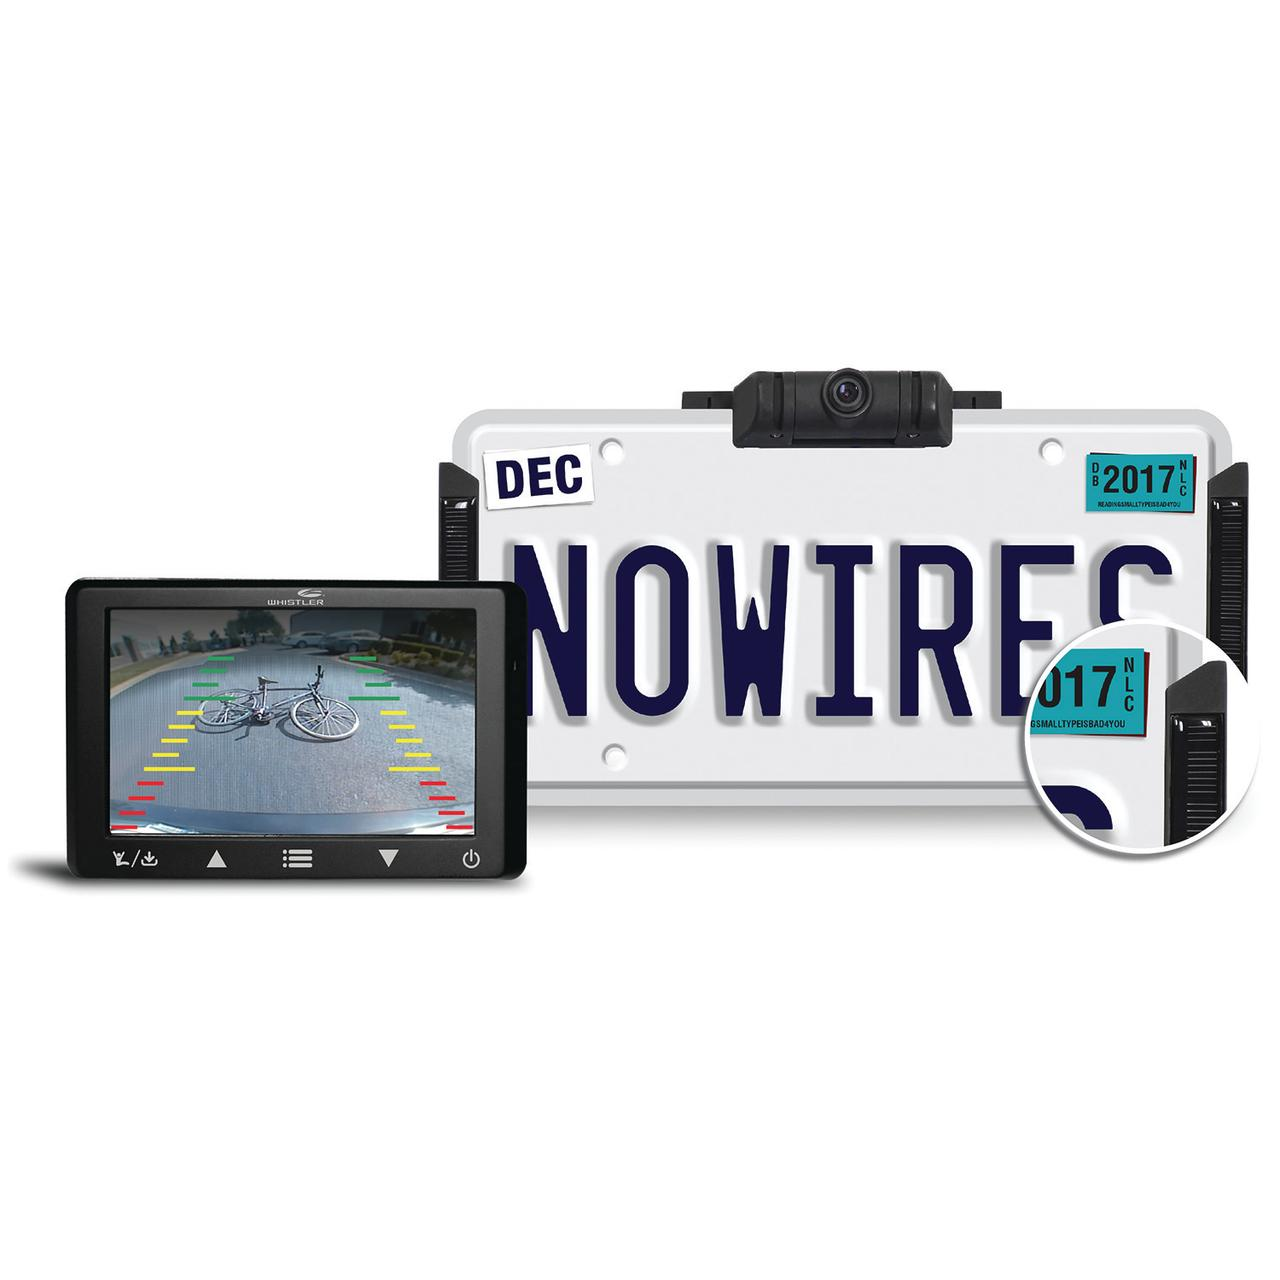 Wireless Backup Camera >> Whistler Wbu 900 Digital Wireless Backup Camera Walmart Com